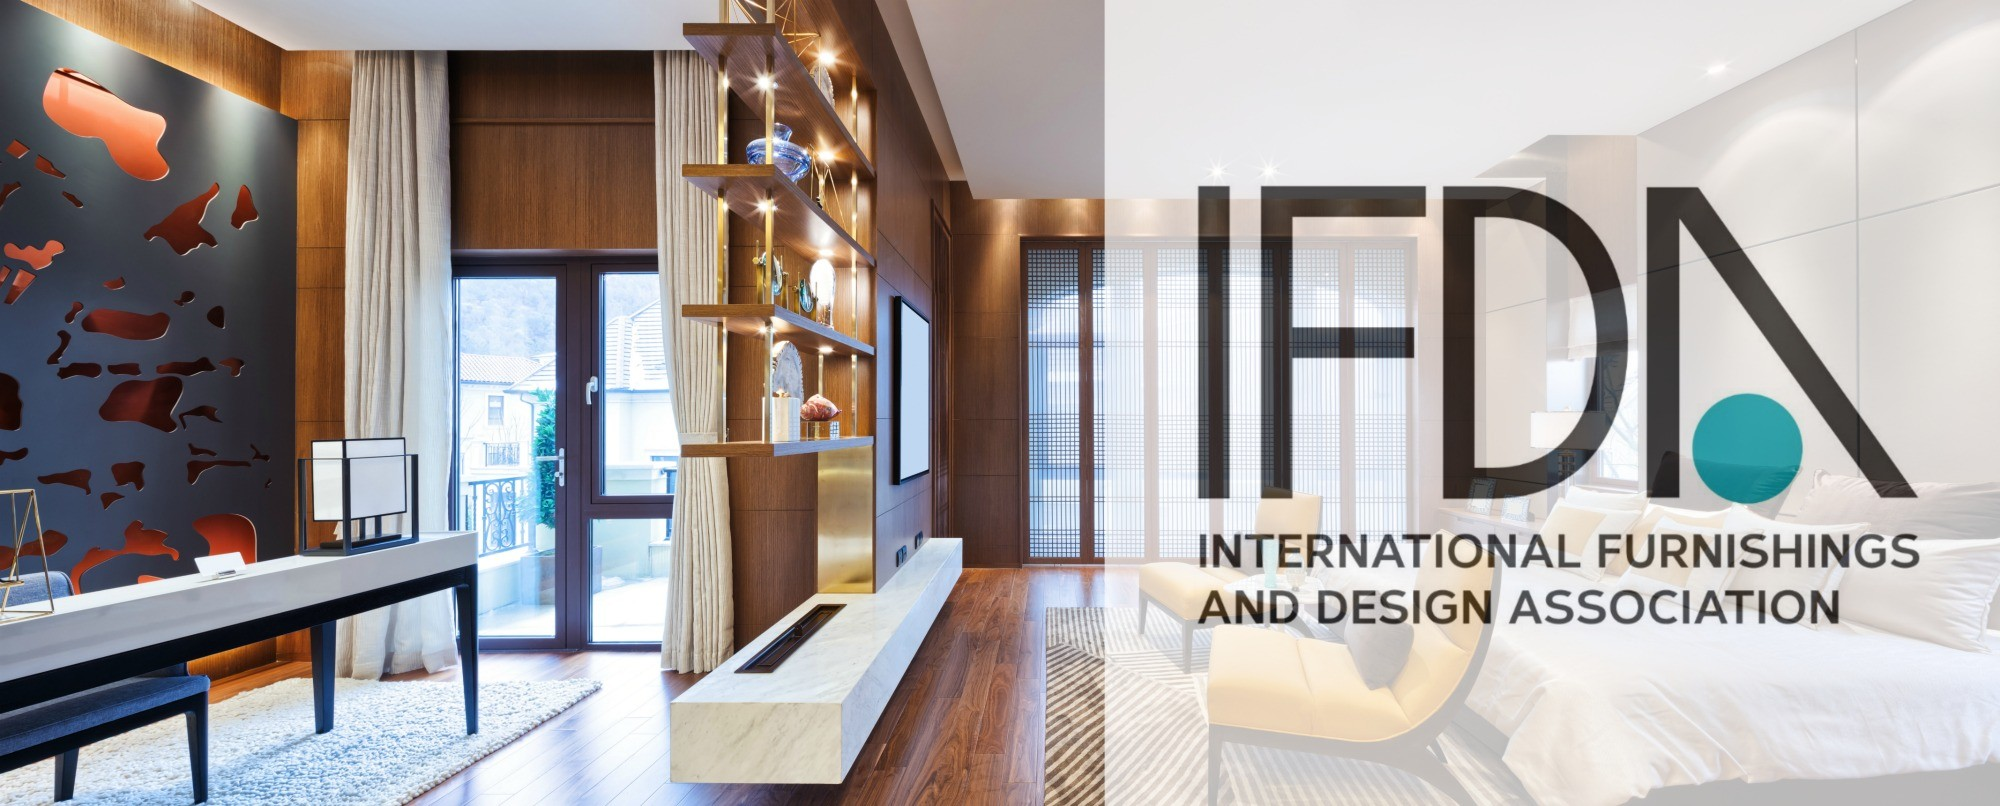 International Furnishings and Design Association (IFDA)